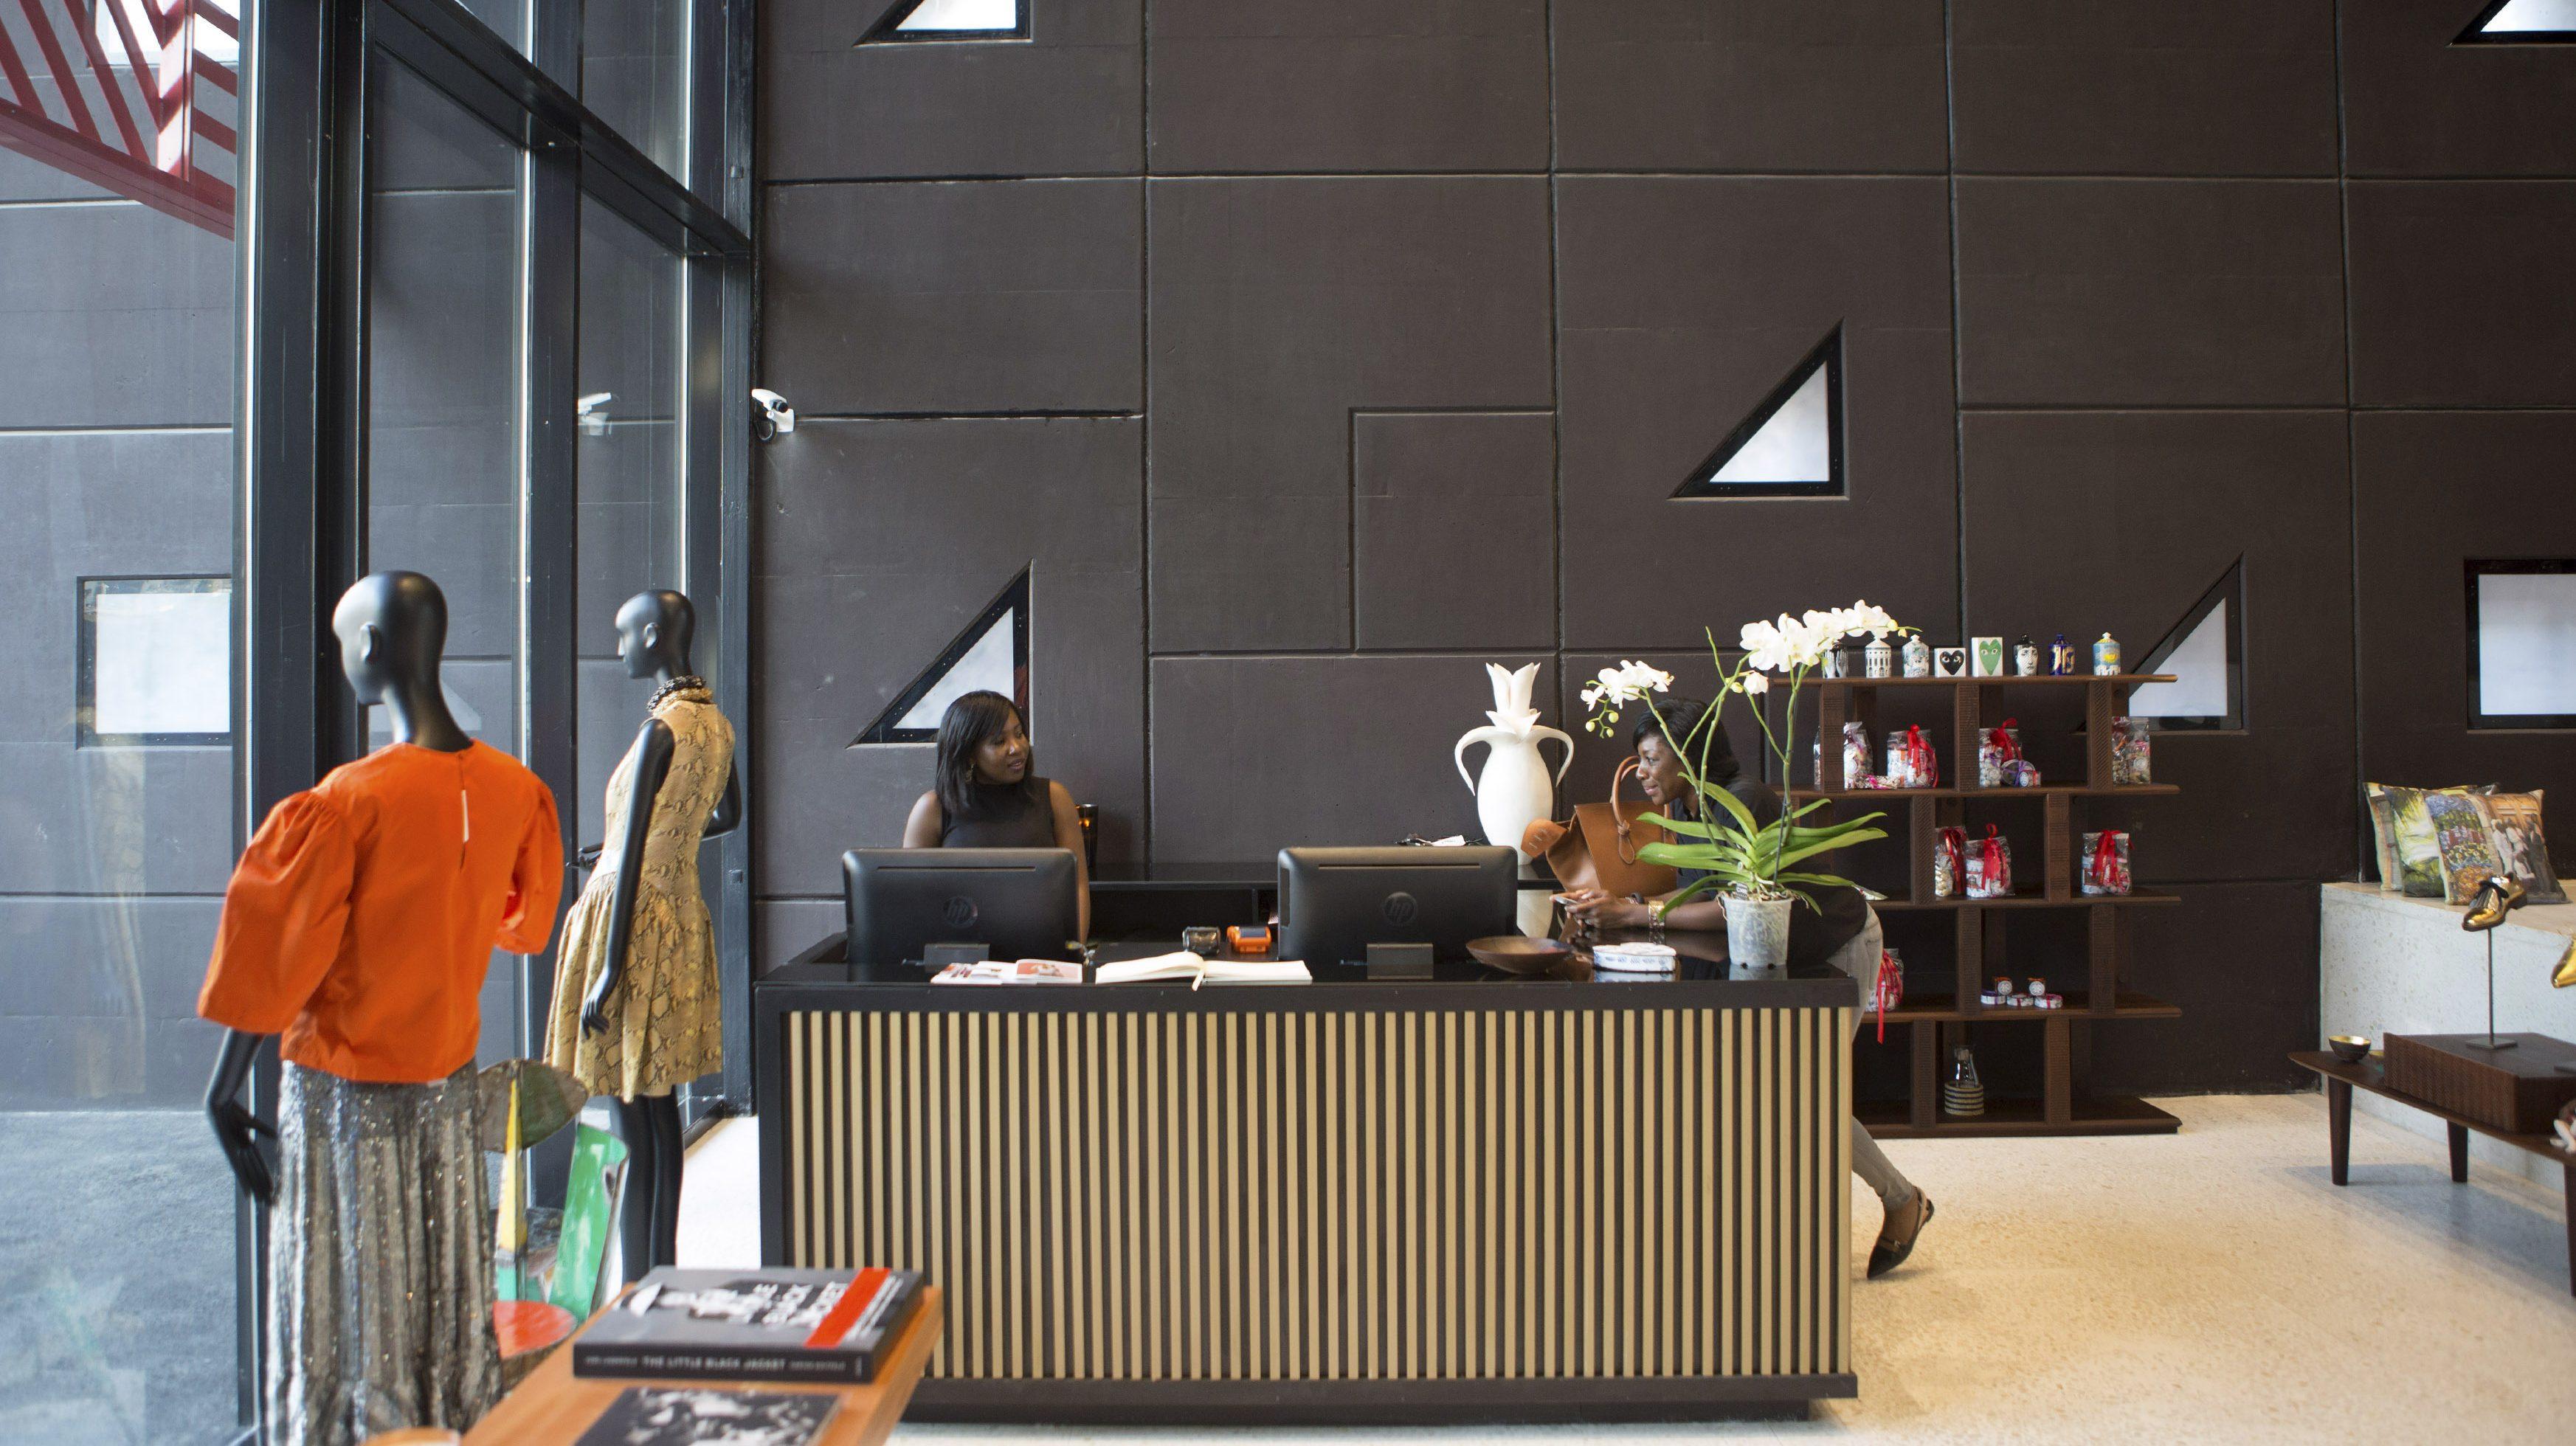 A picture of the receptionist area at Alara, a concept fashion store in Lagos, Nigeria